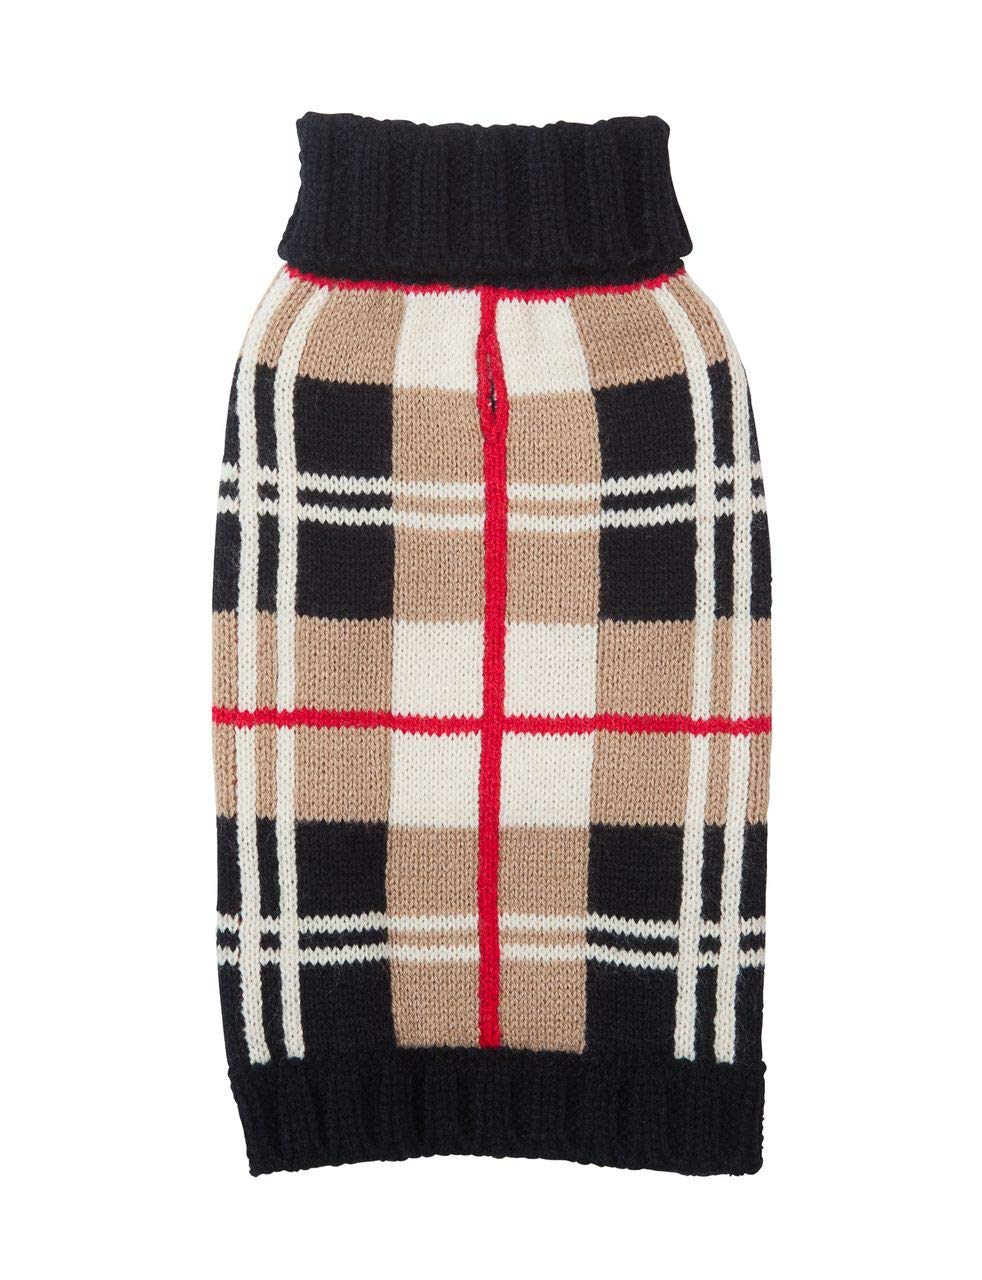 Dog Sweater - Tan Plaid (burberry-like) by Fab Dog, 12 inch